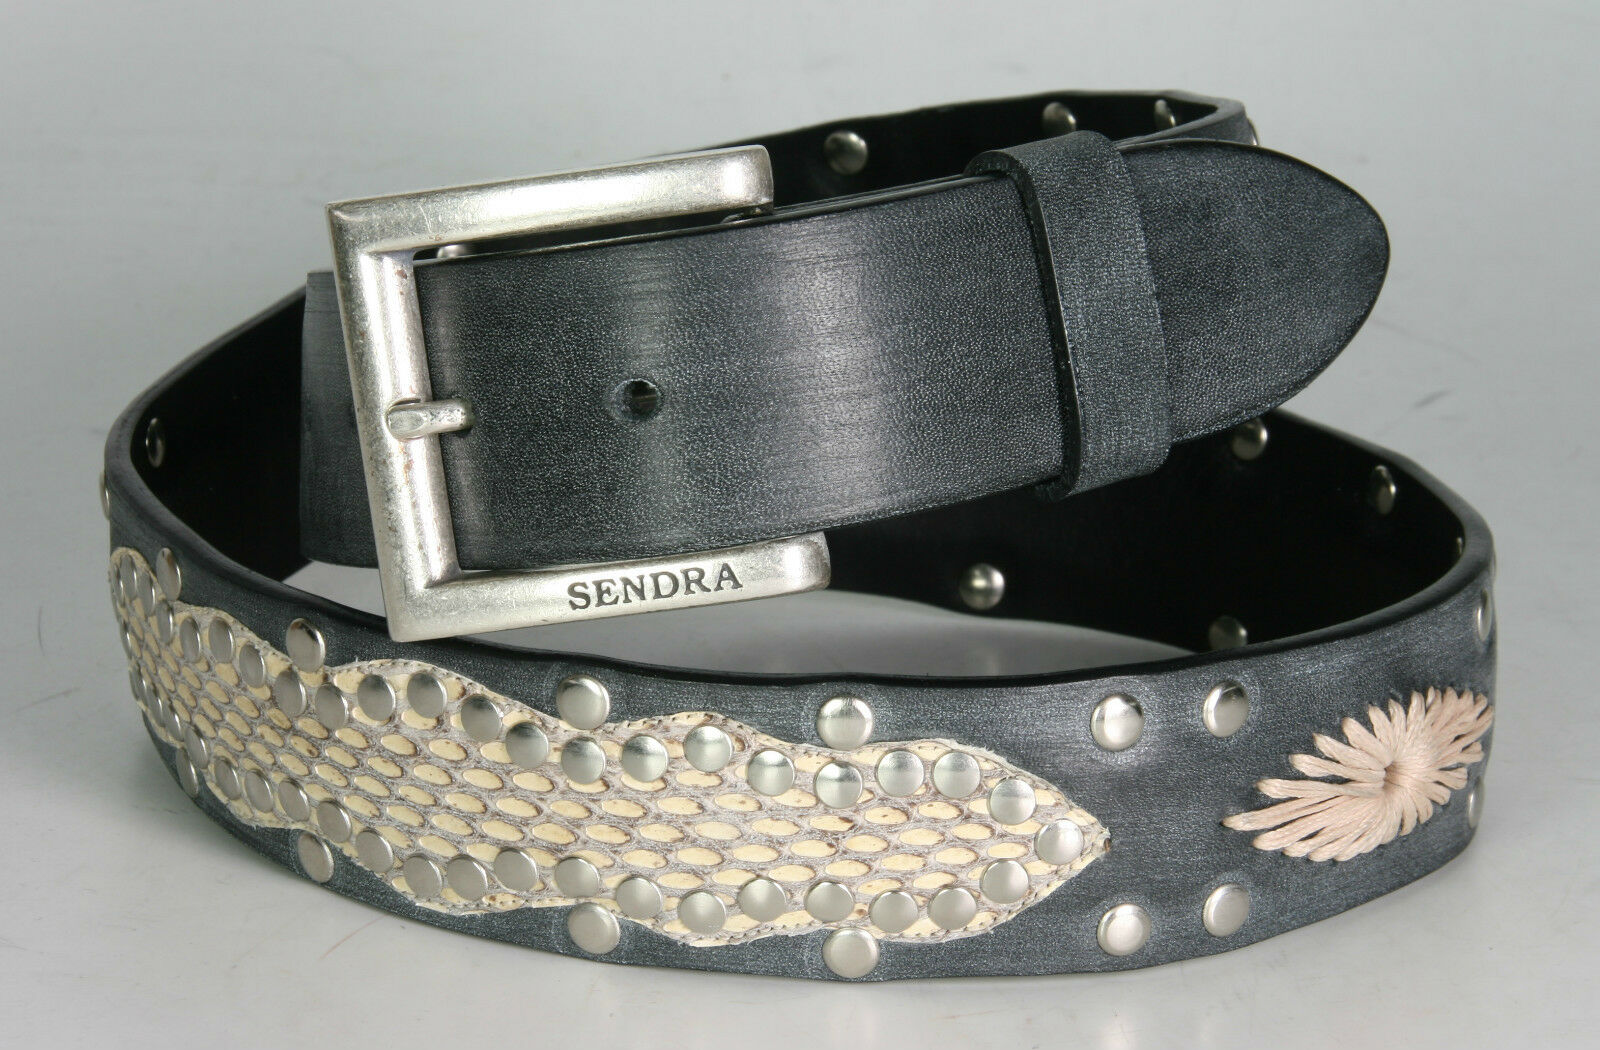 1176 Sendra Gürtel Negro Kobra Natural Wechselgürtel echt Leder